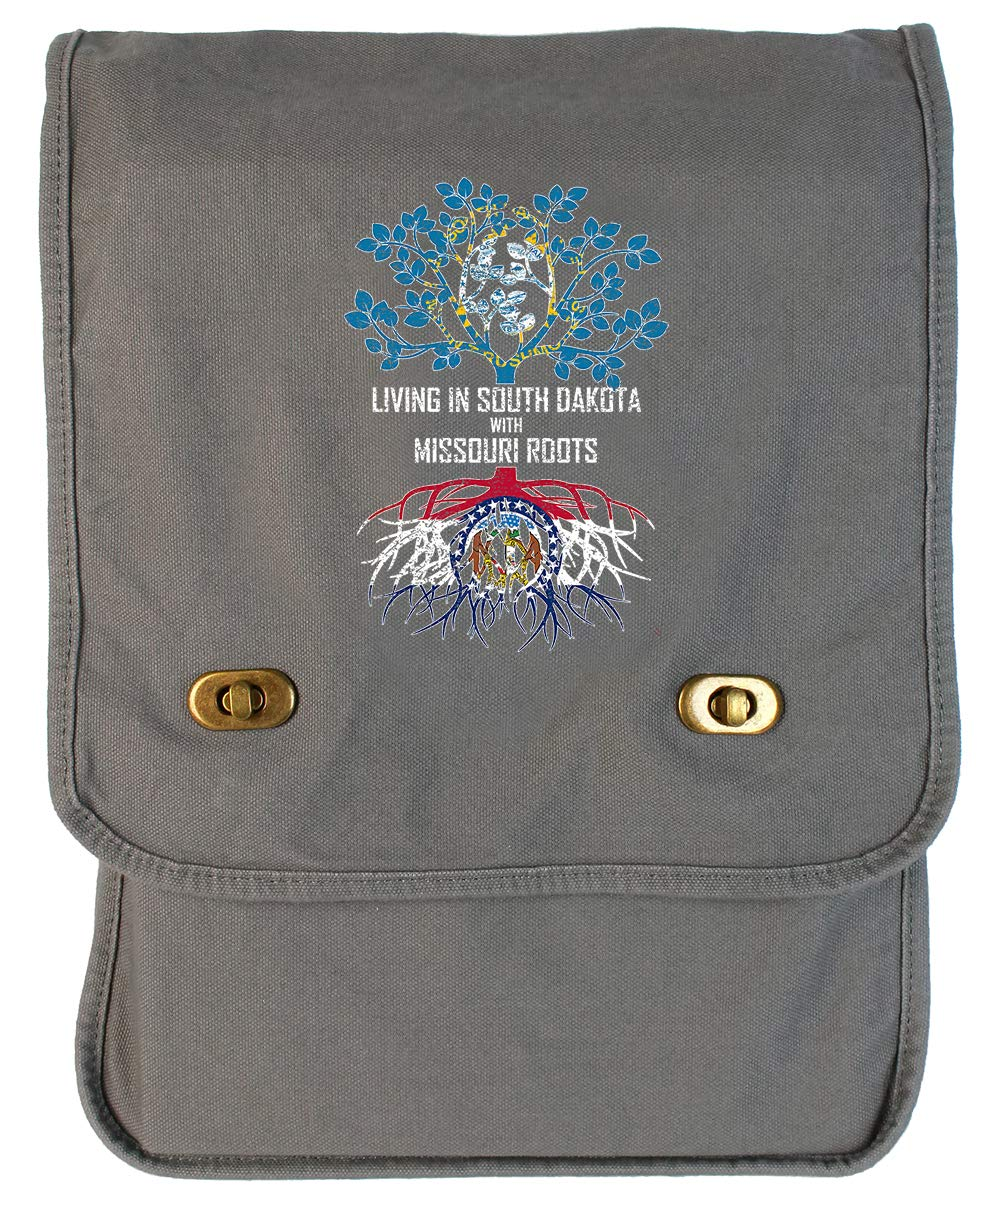 Tenacitee Living In South Dakota with Missouri Roots Grey Brushed Canvas Messenger Bag